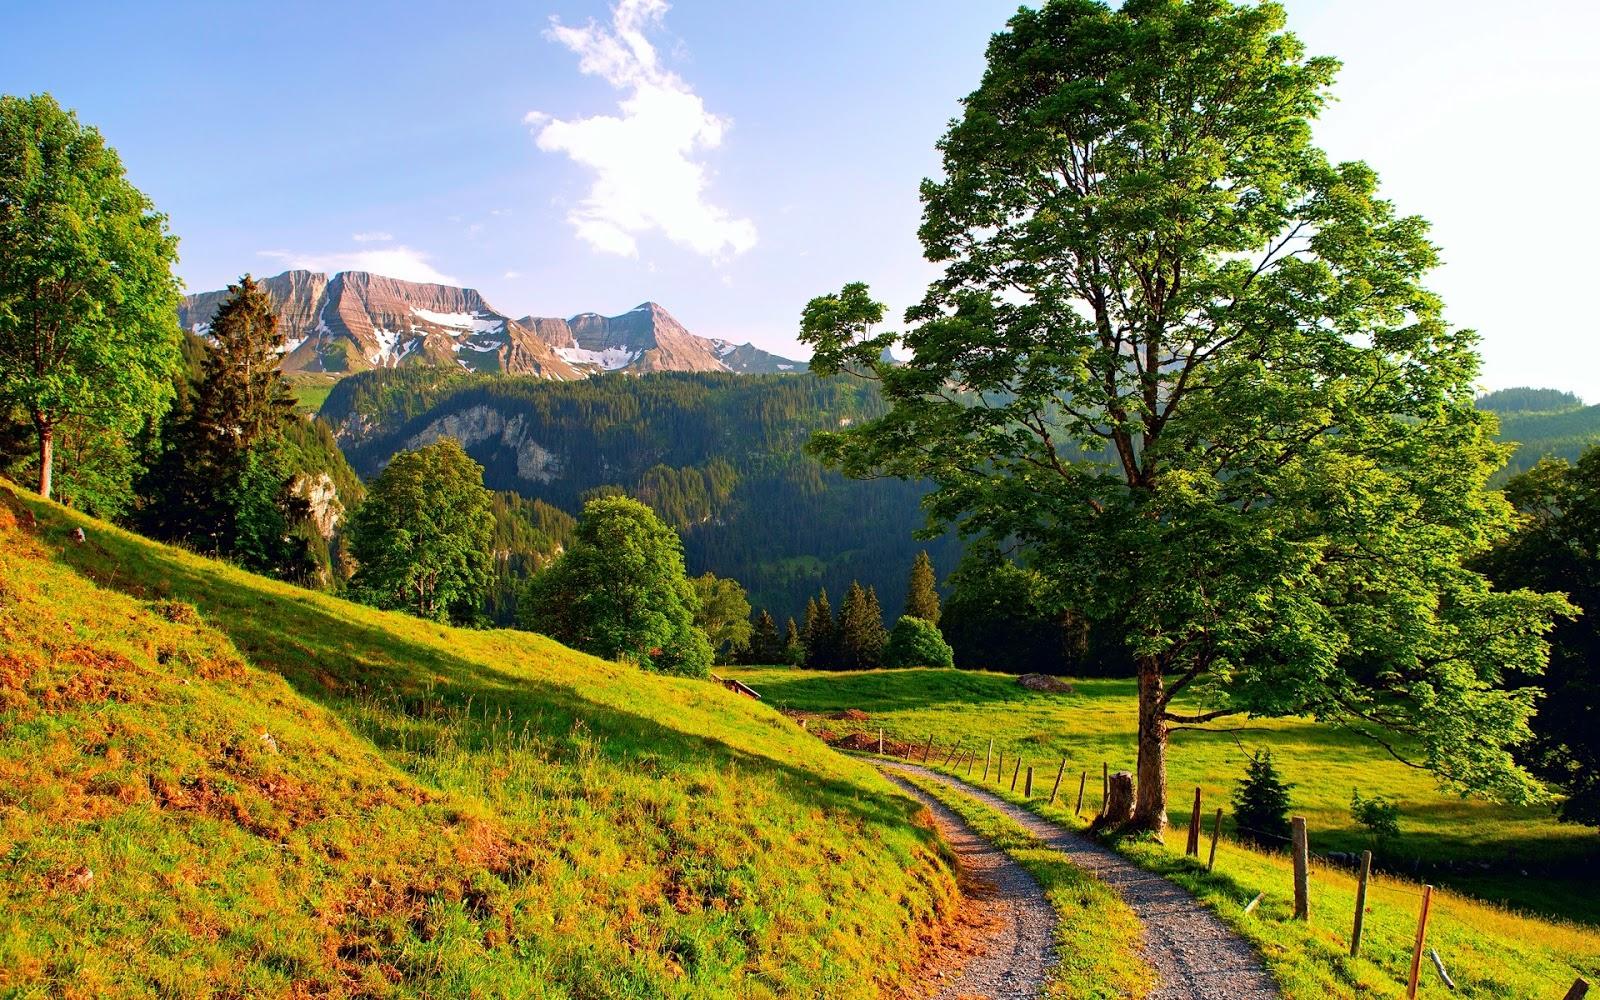 wallpaper mountain path - photo #15